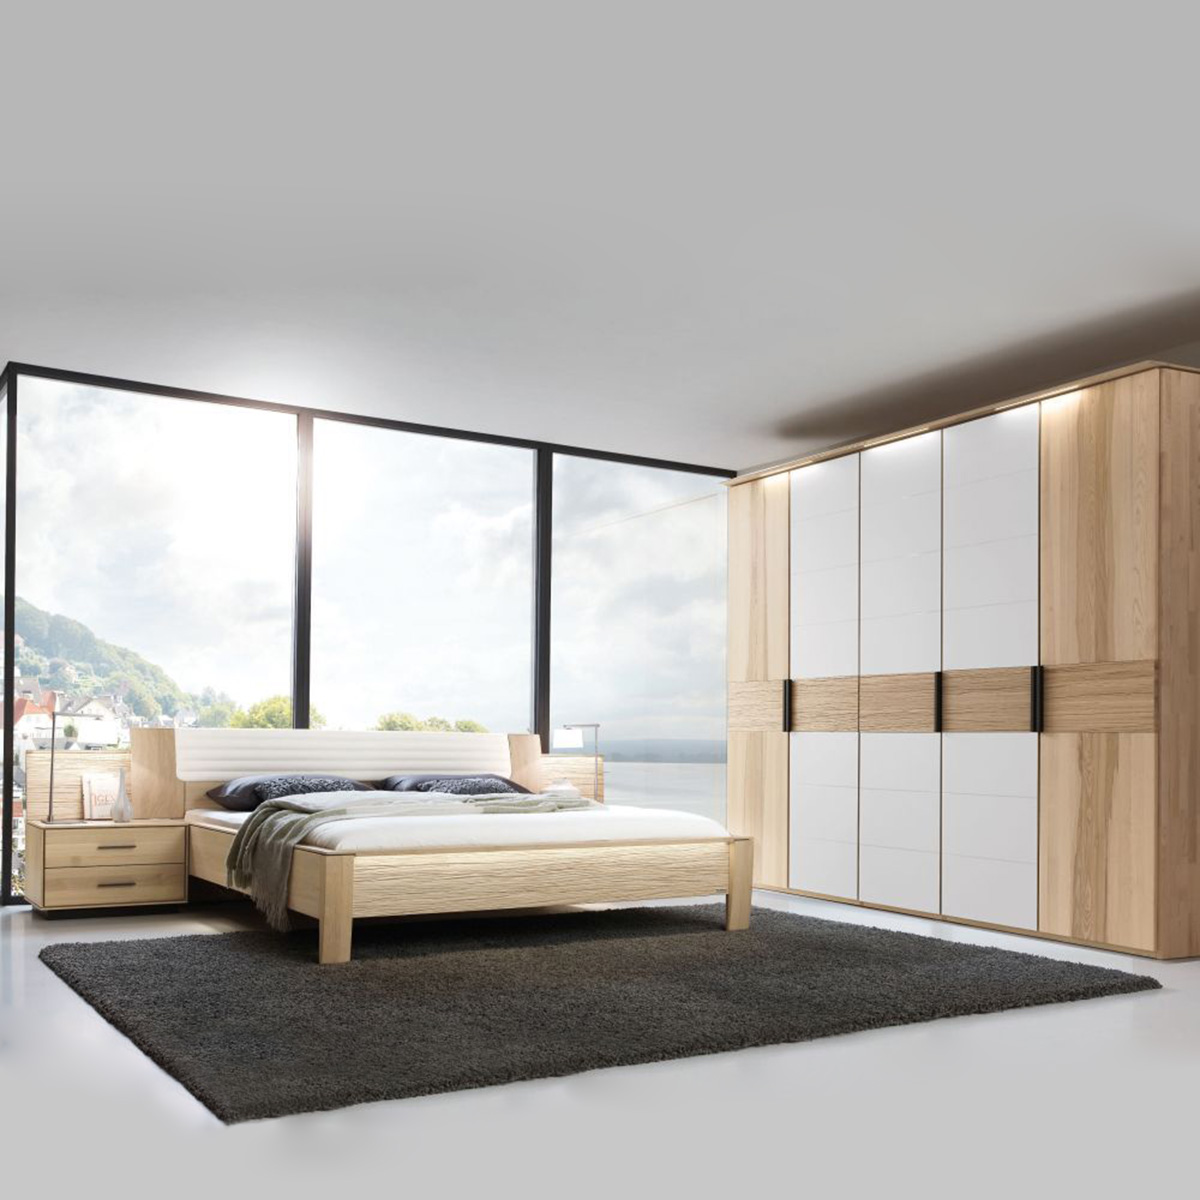 Thielemeyer Schlafzimmer Mira Multi 3 - Möbel Bär AG